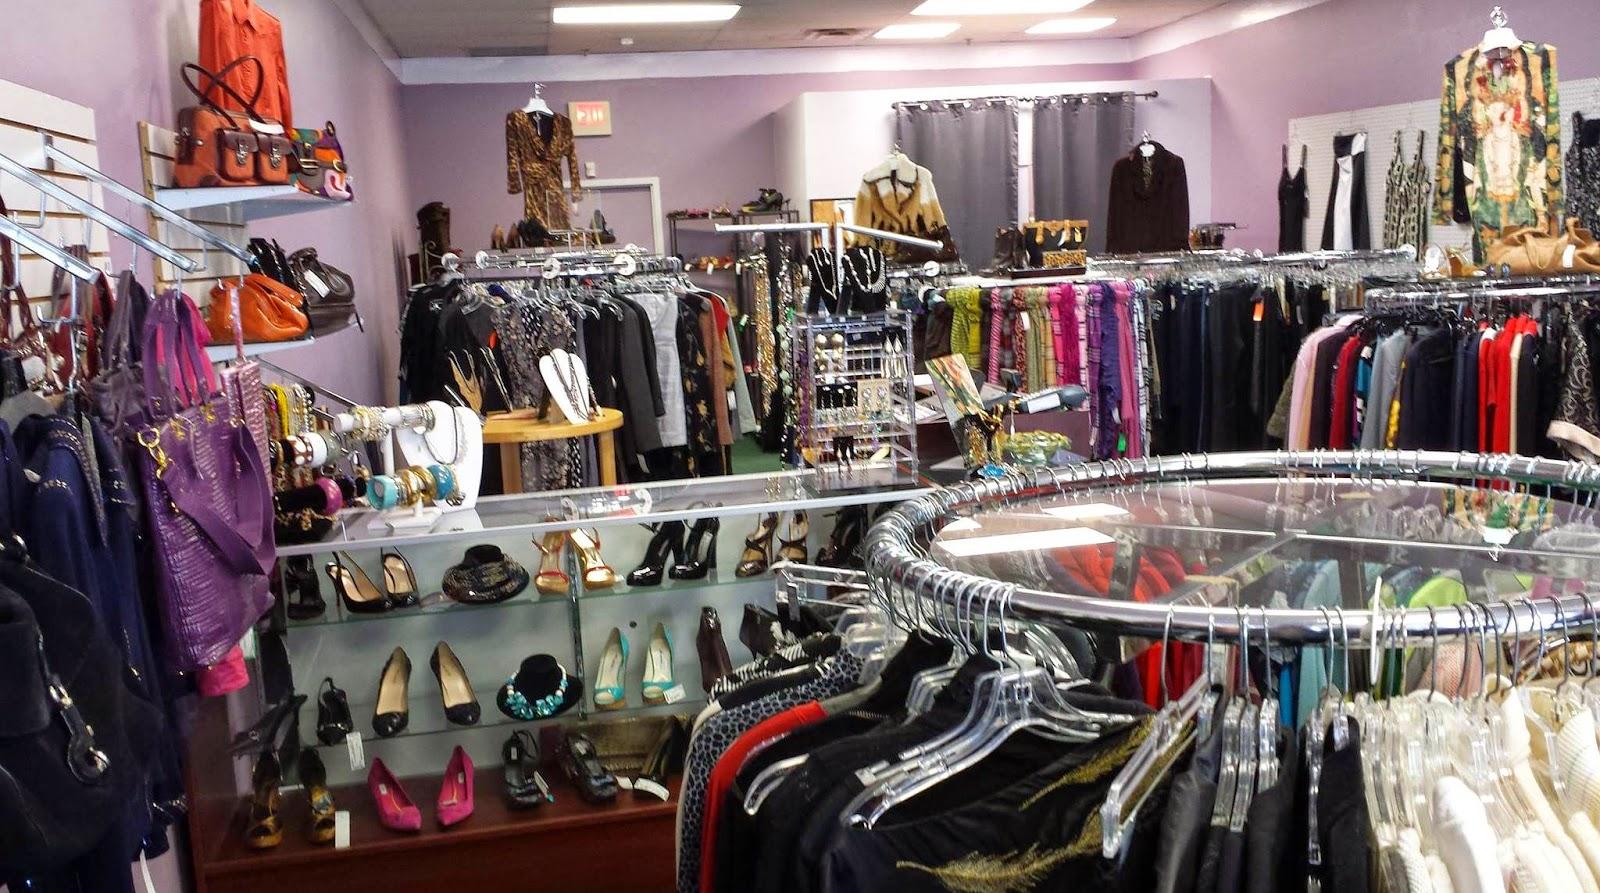 Resale Cosignment Store Ormond Beach Fl